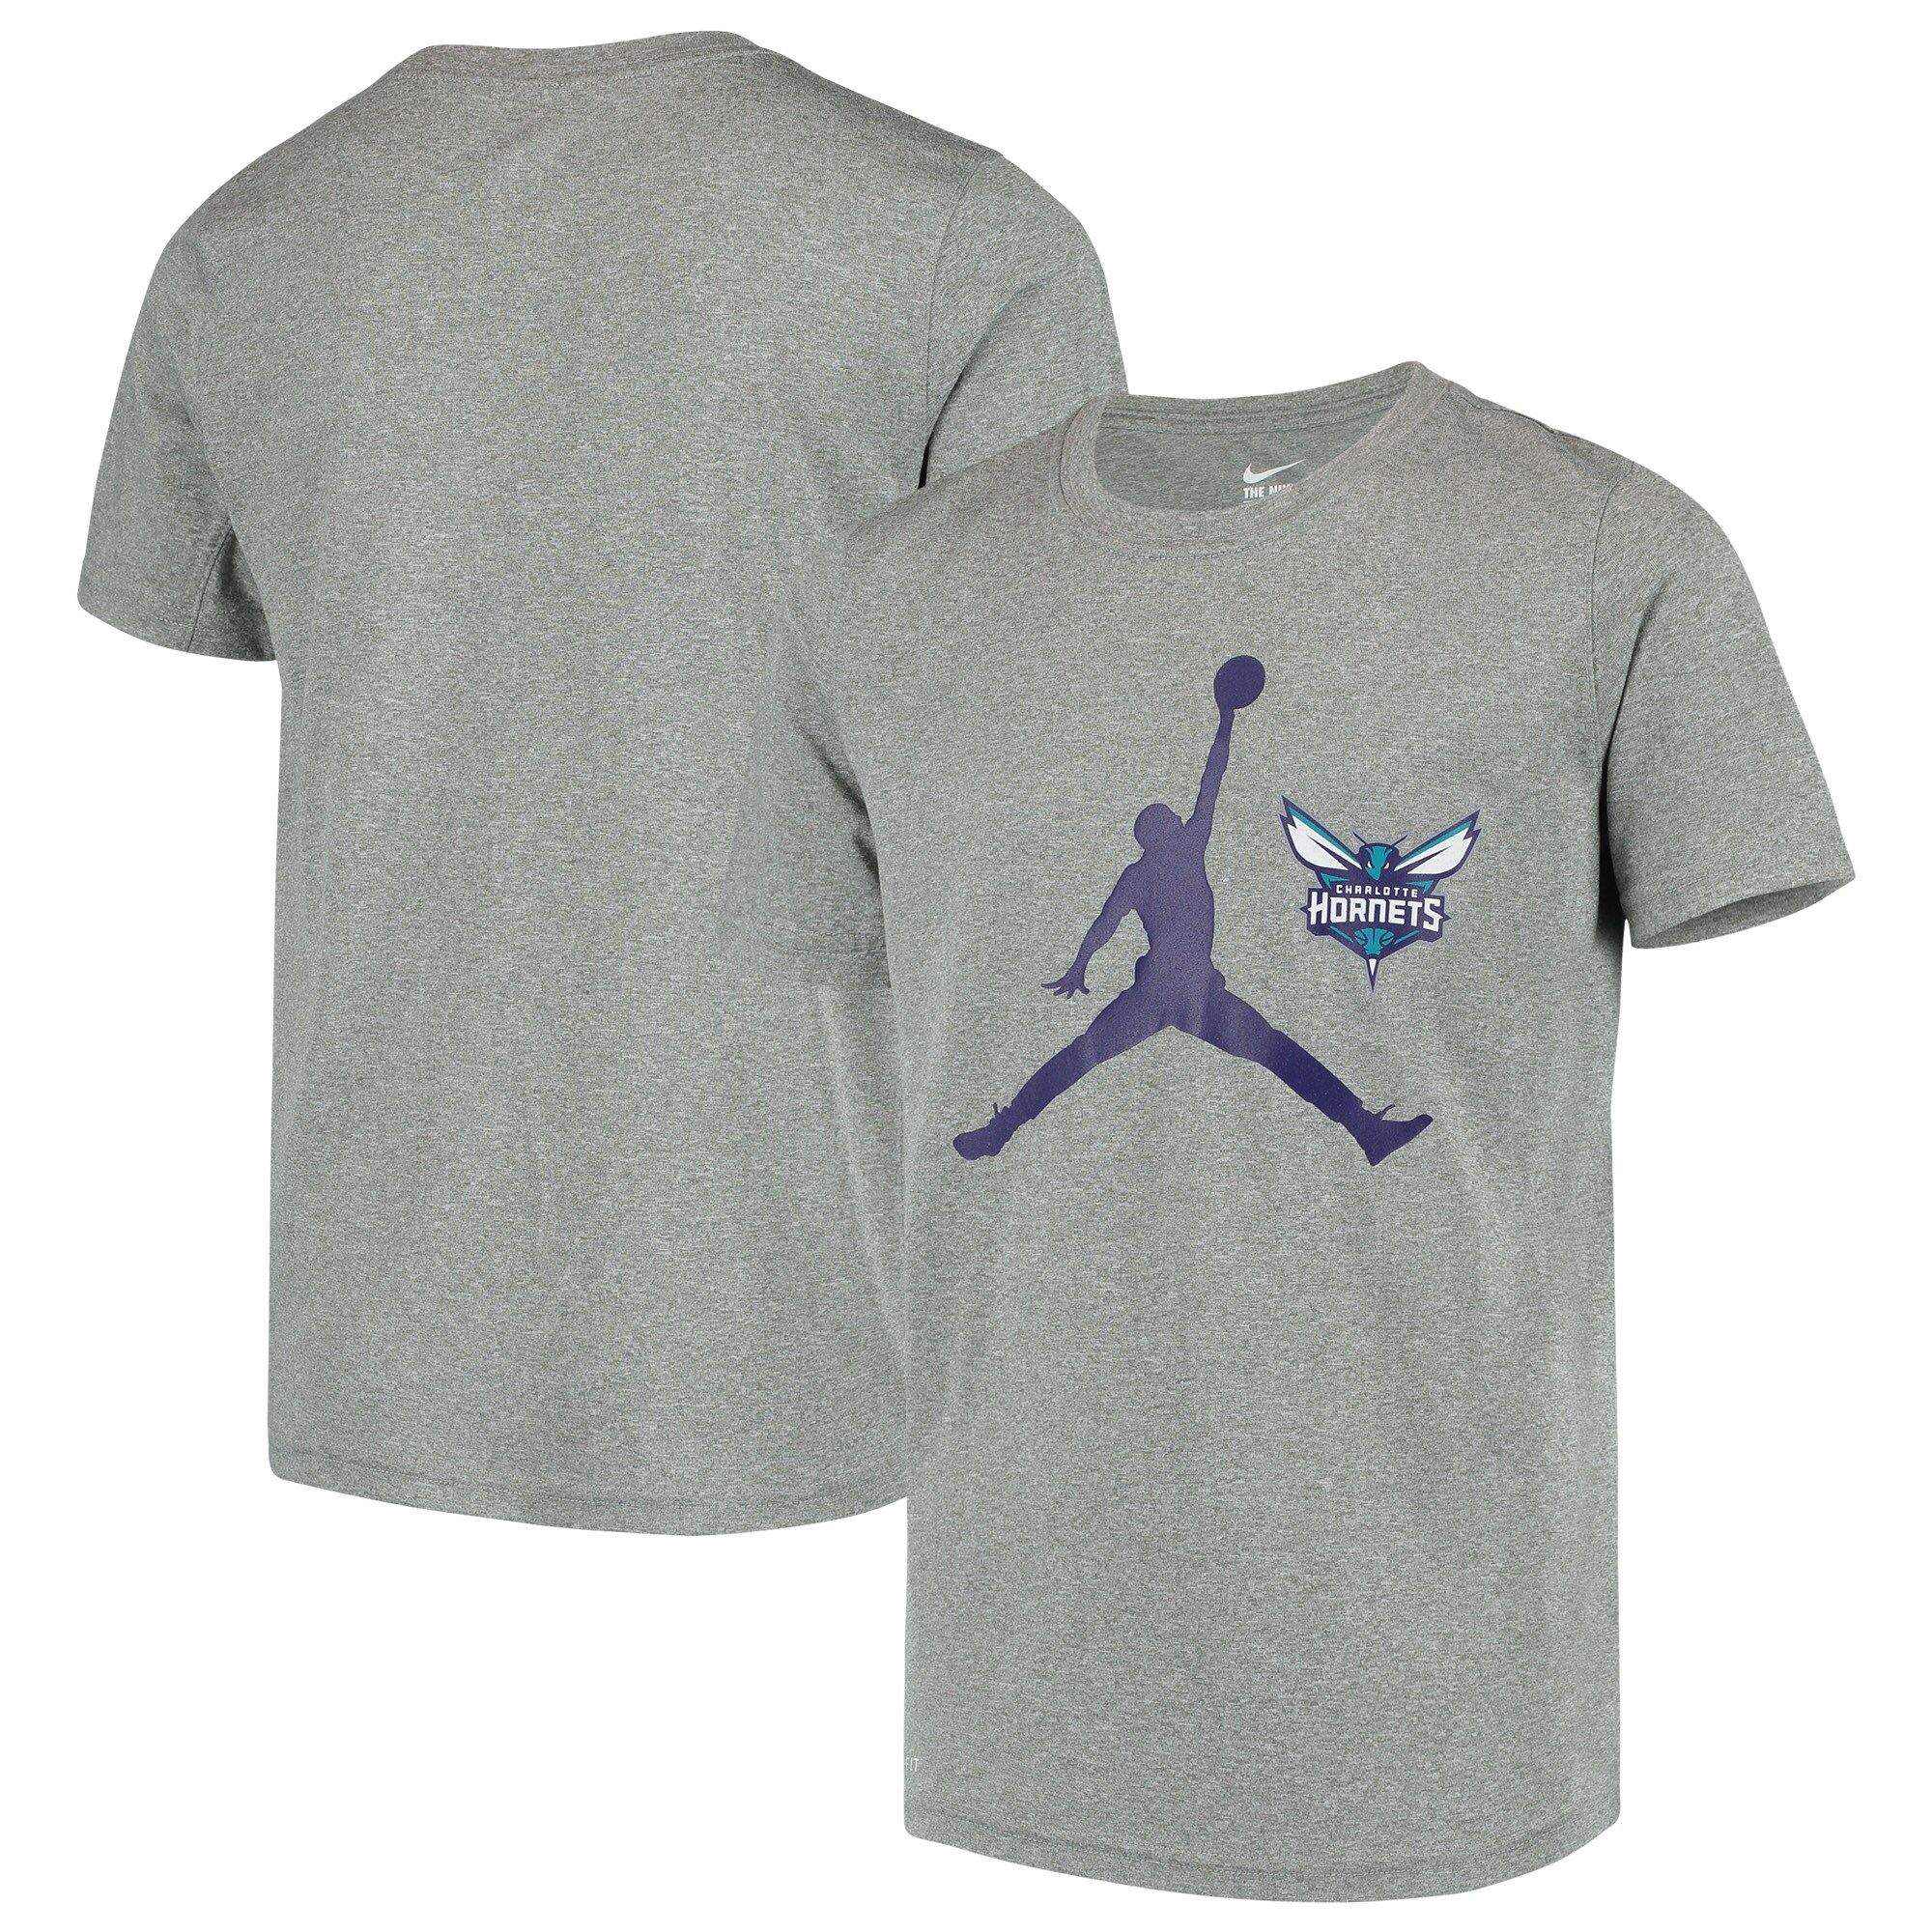 Charlotte Hornets Jordan Brand Youth Swoosh Logo Legend T-Shirt - Heathered Gray